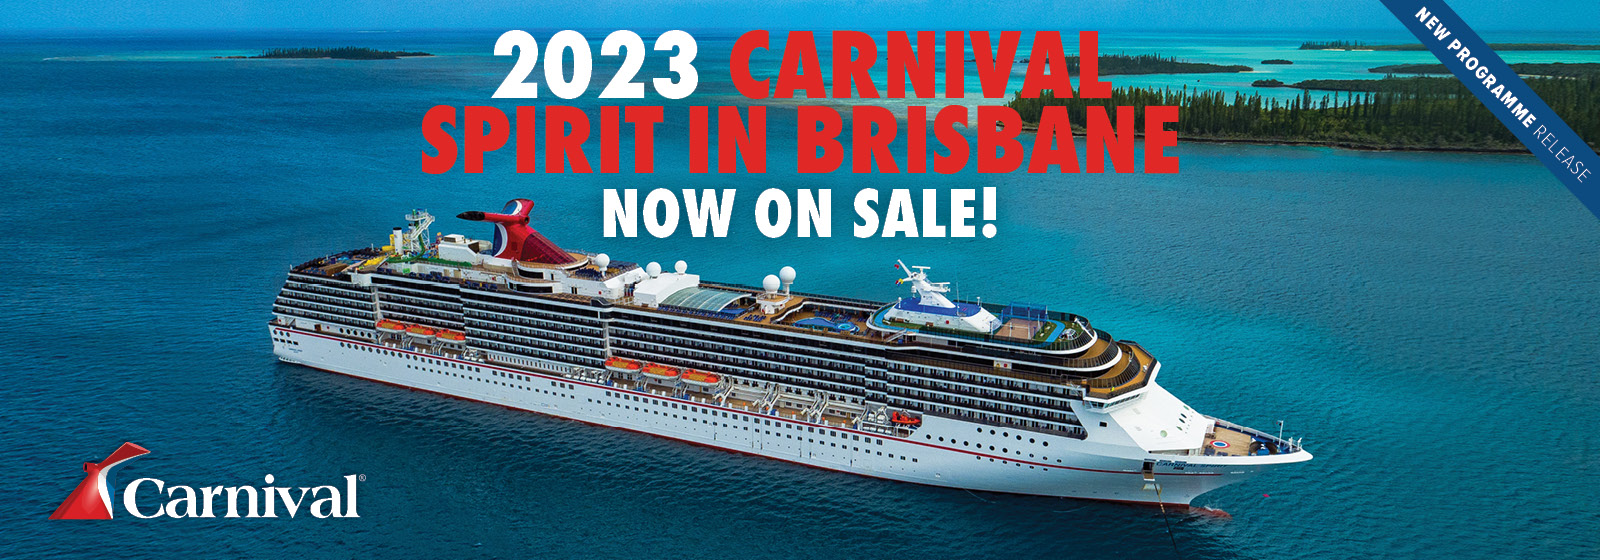 Carnival-brisbane-23